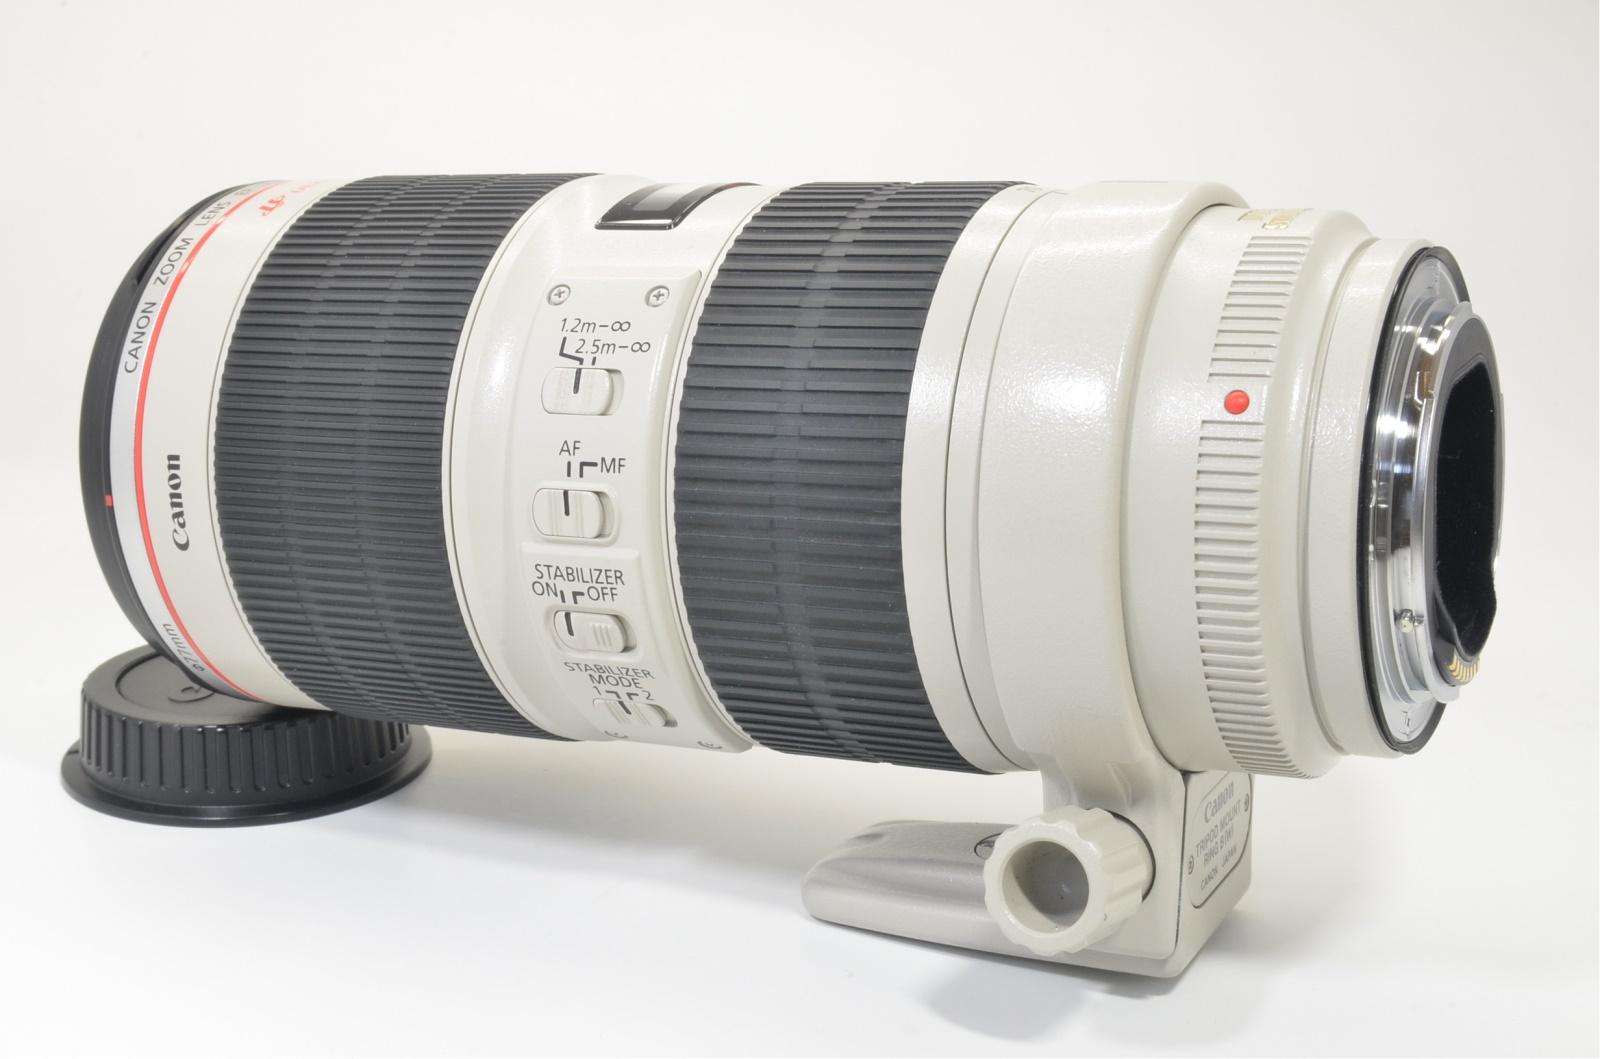 canon ef 70-200mm f/2.8 l is ii usm ultrasonic lens shooting tested